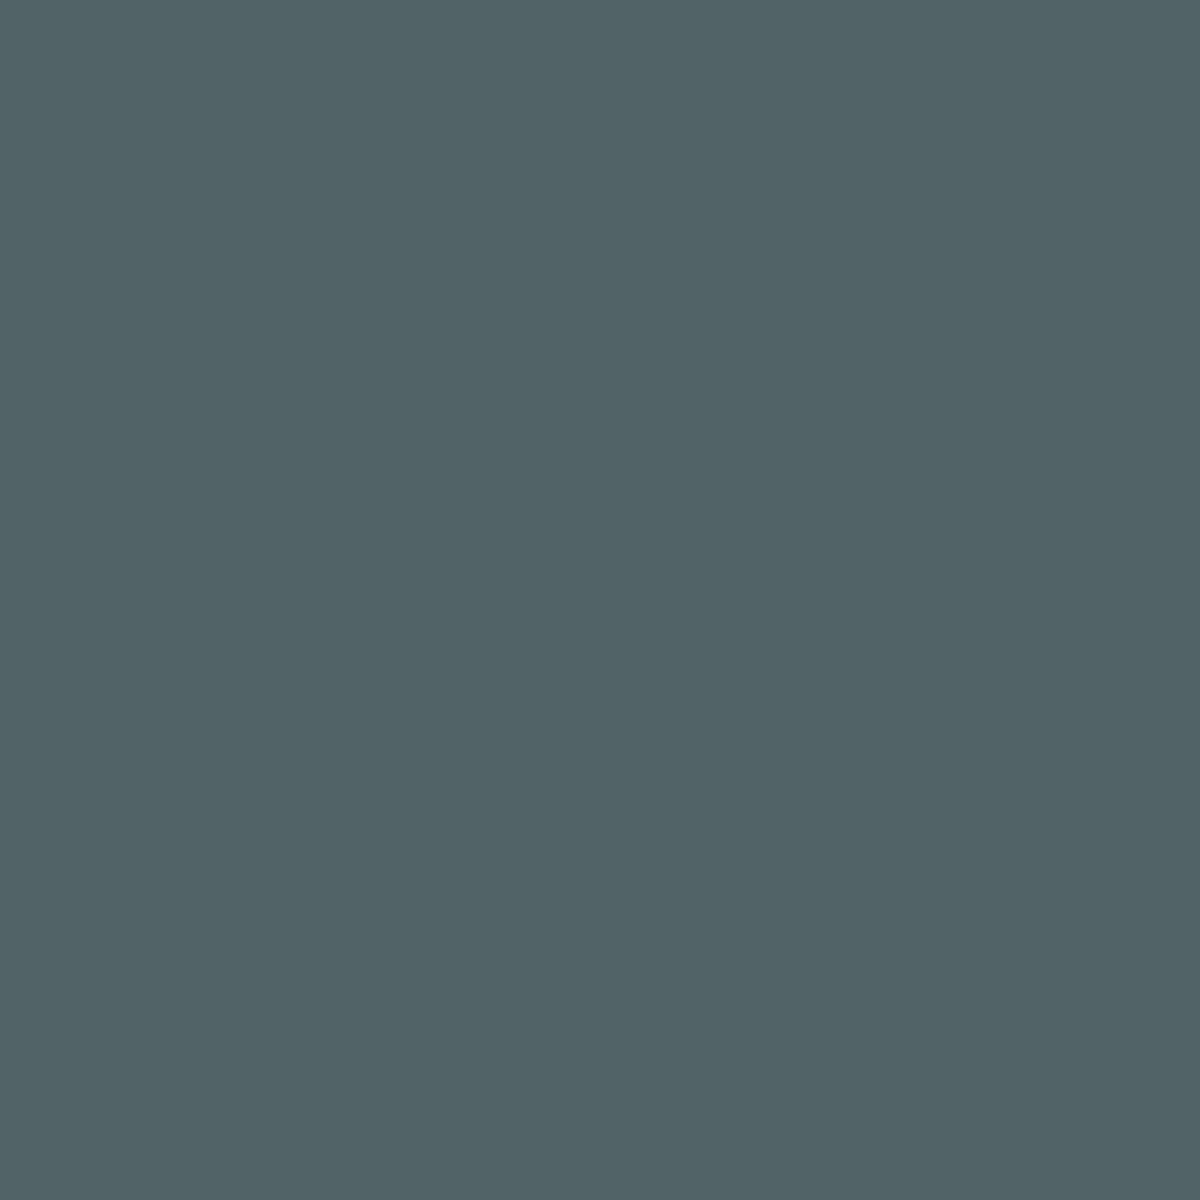 Ironworks Radiators Inc. farrow and ball inchyra blue paint finish